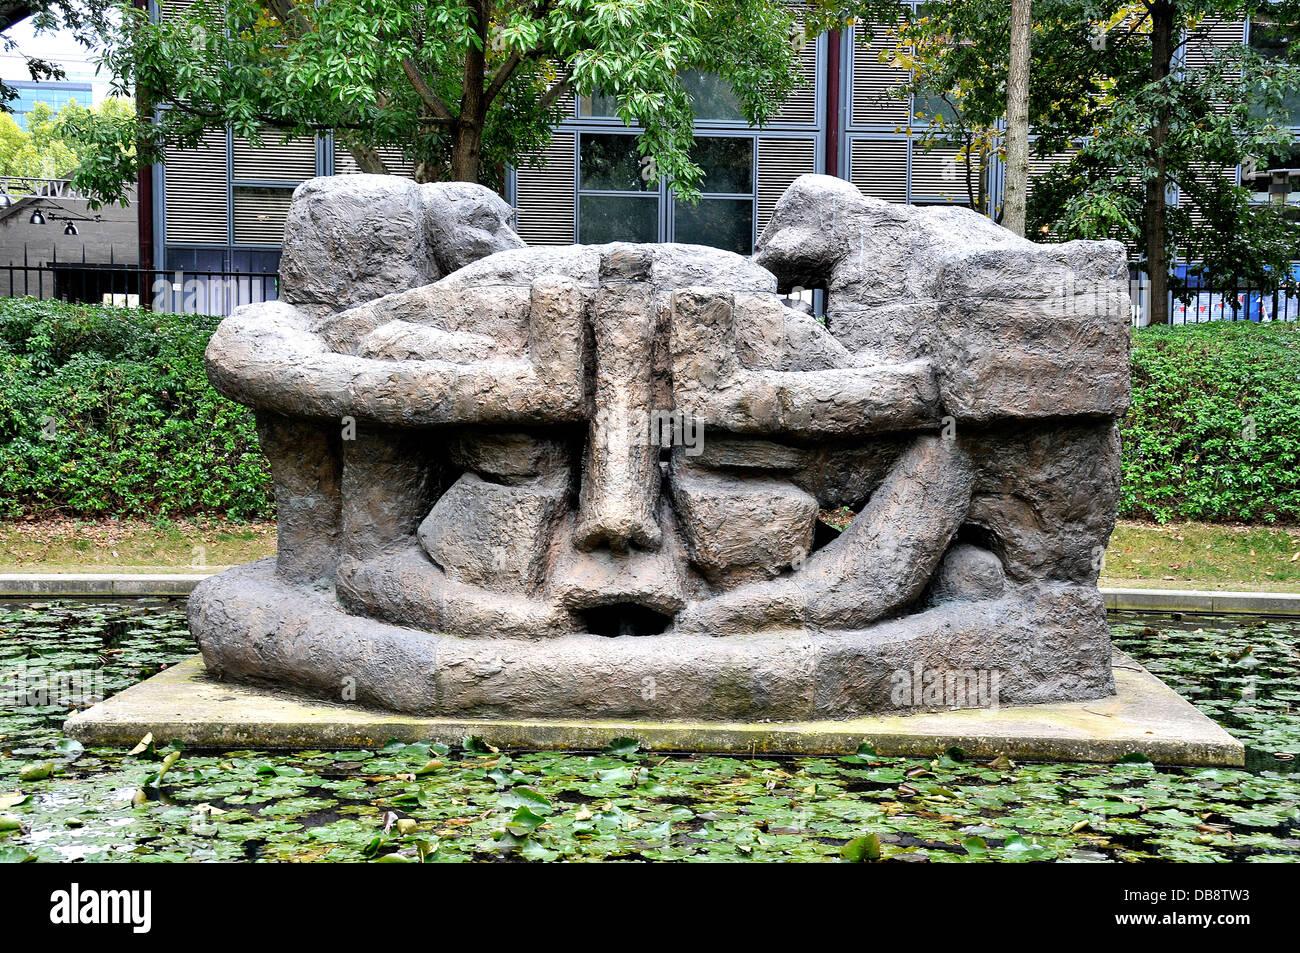 Demeure X modern aquatic sculpture by Etienne Martin in Yitzhak Rabin park Bercy park Paris France Stock Photo